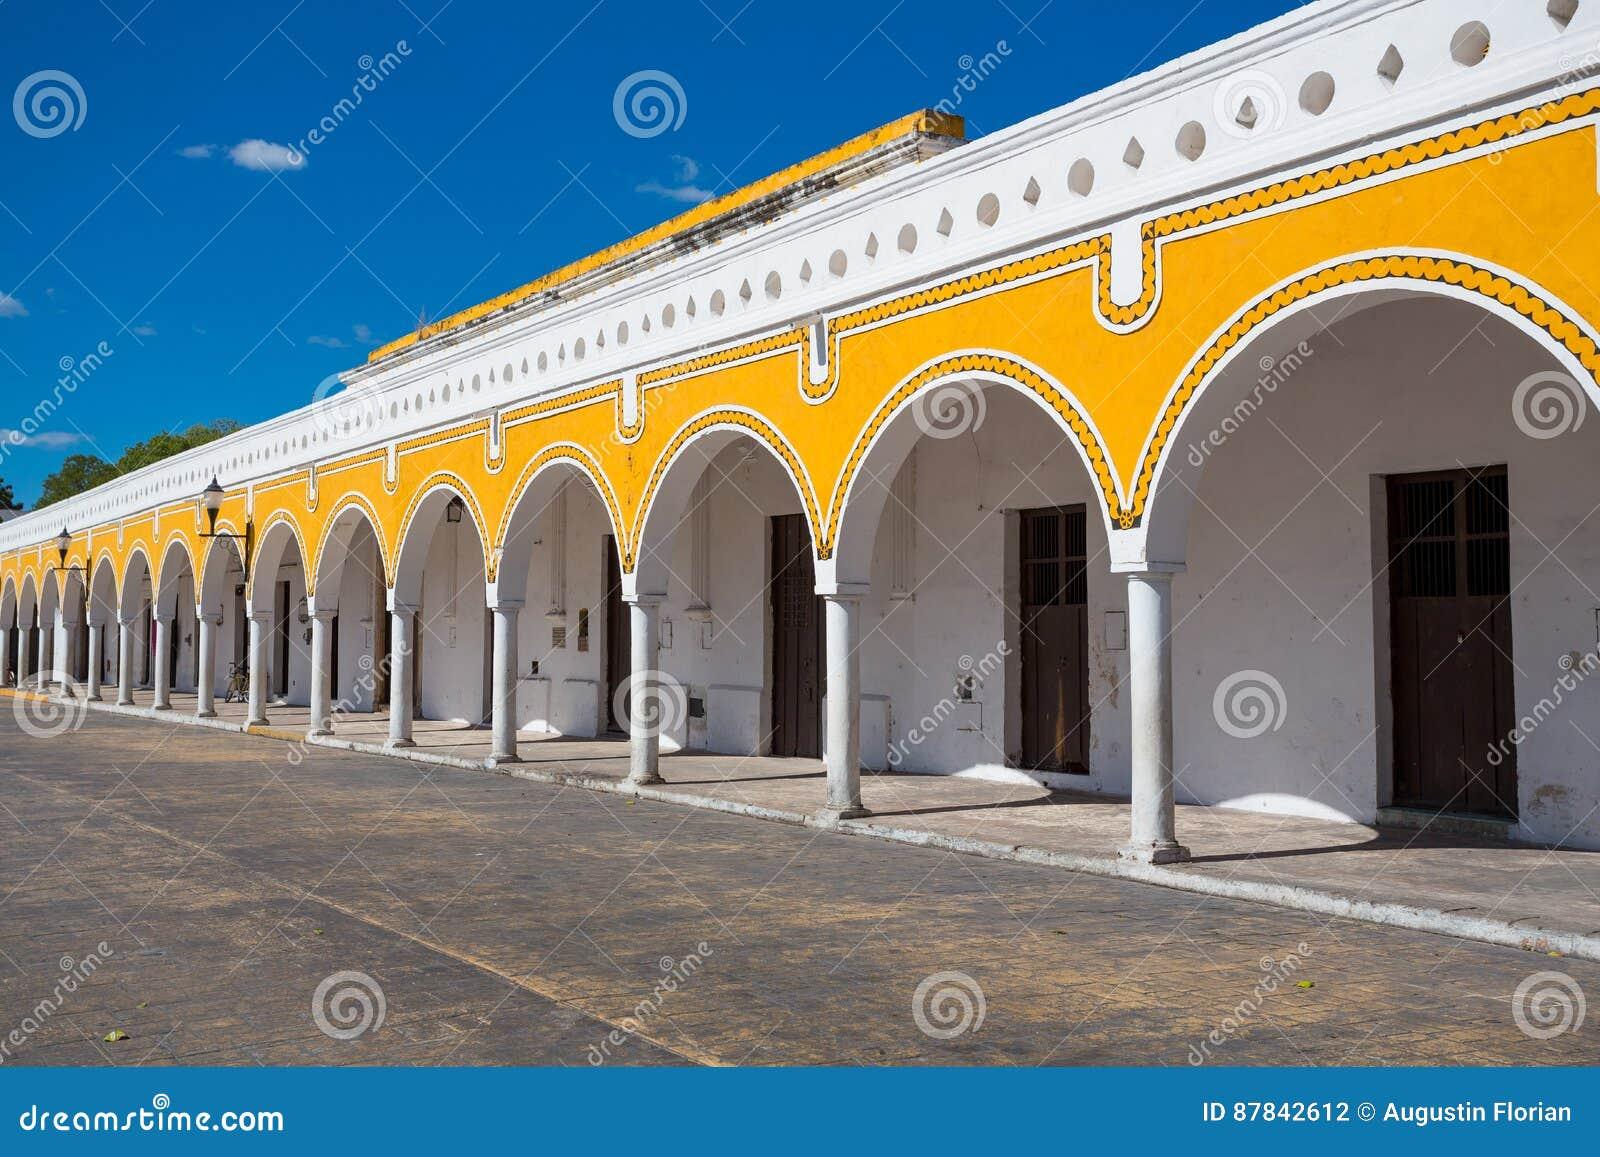 Yellow building in Izamal, Mexico